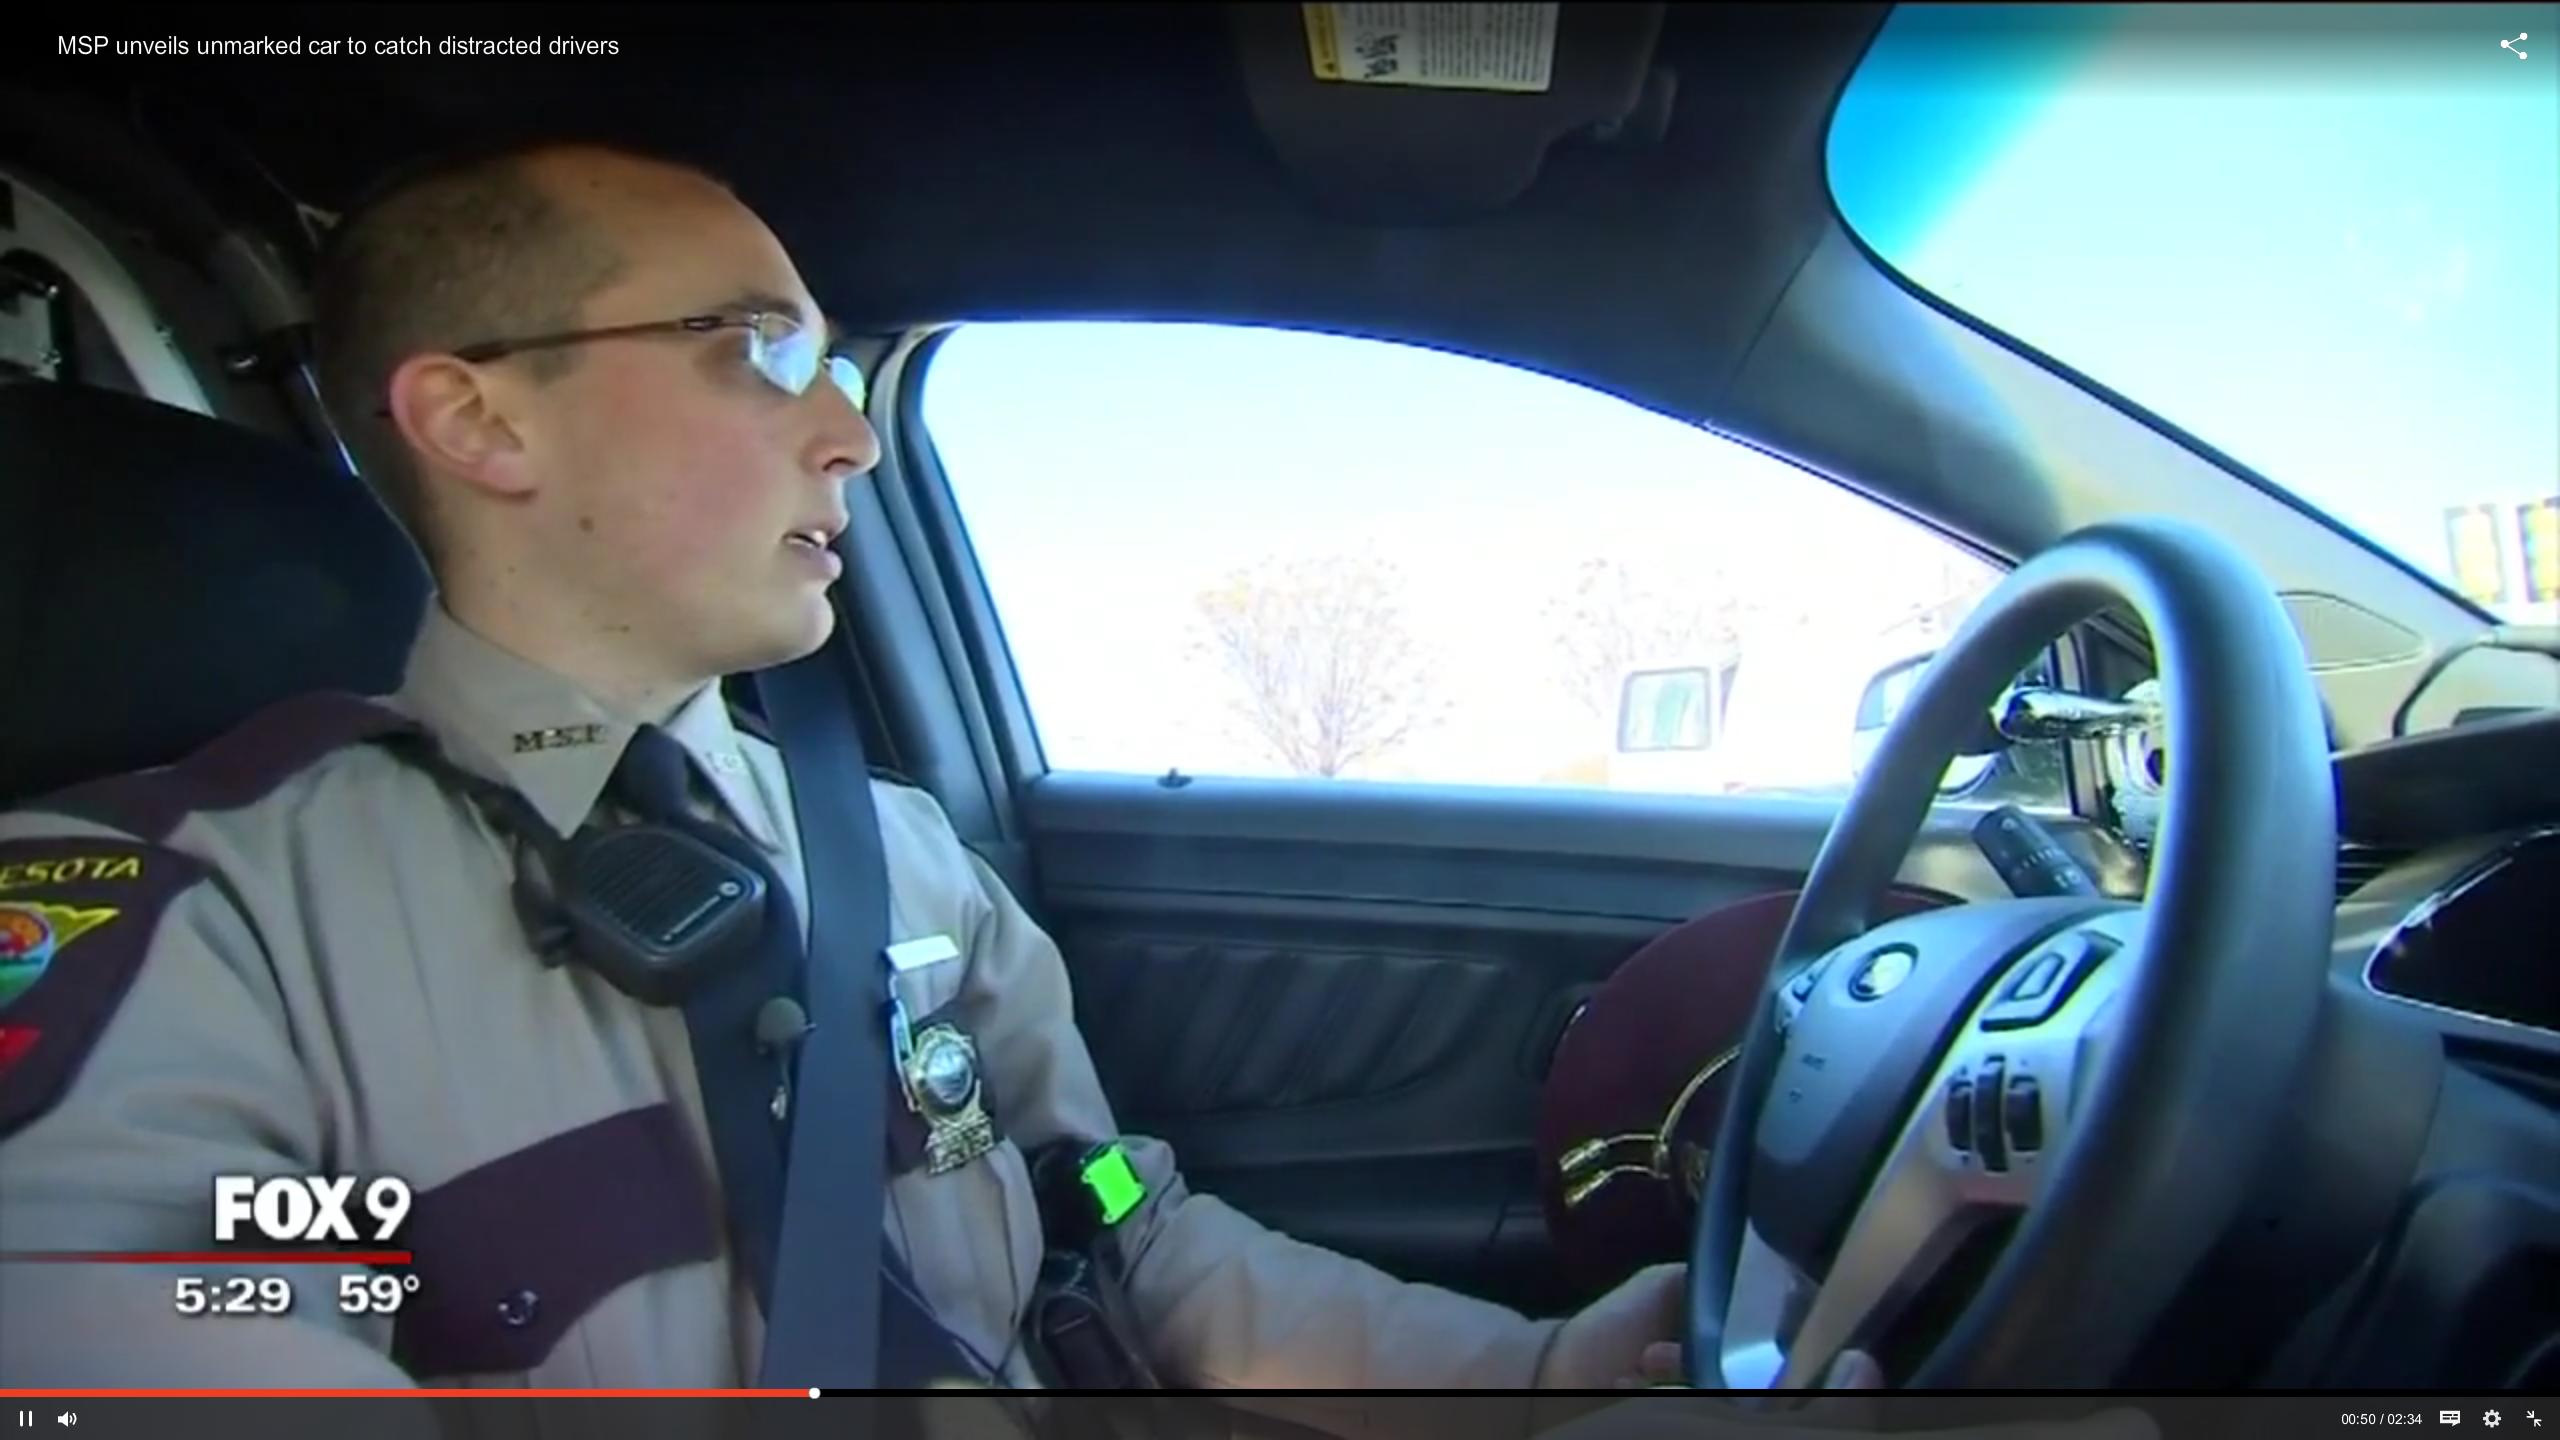 Minn. Cracks Down on Distracted Driving